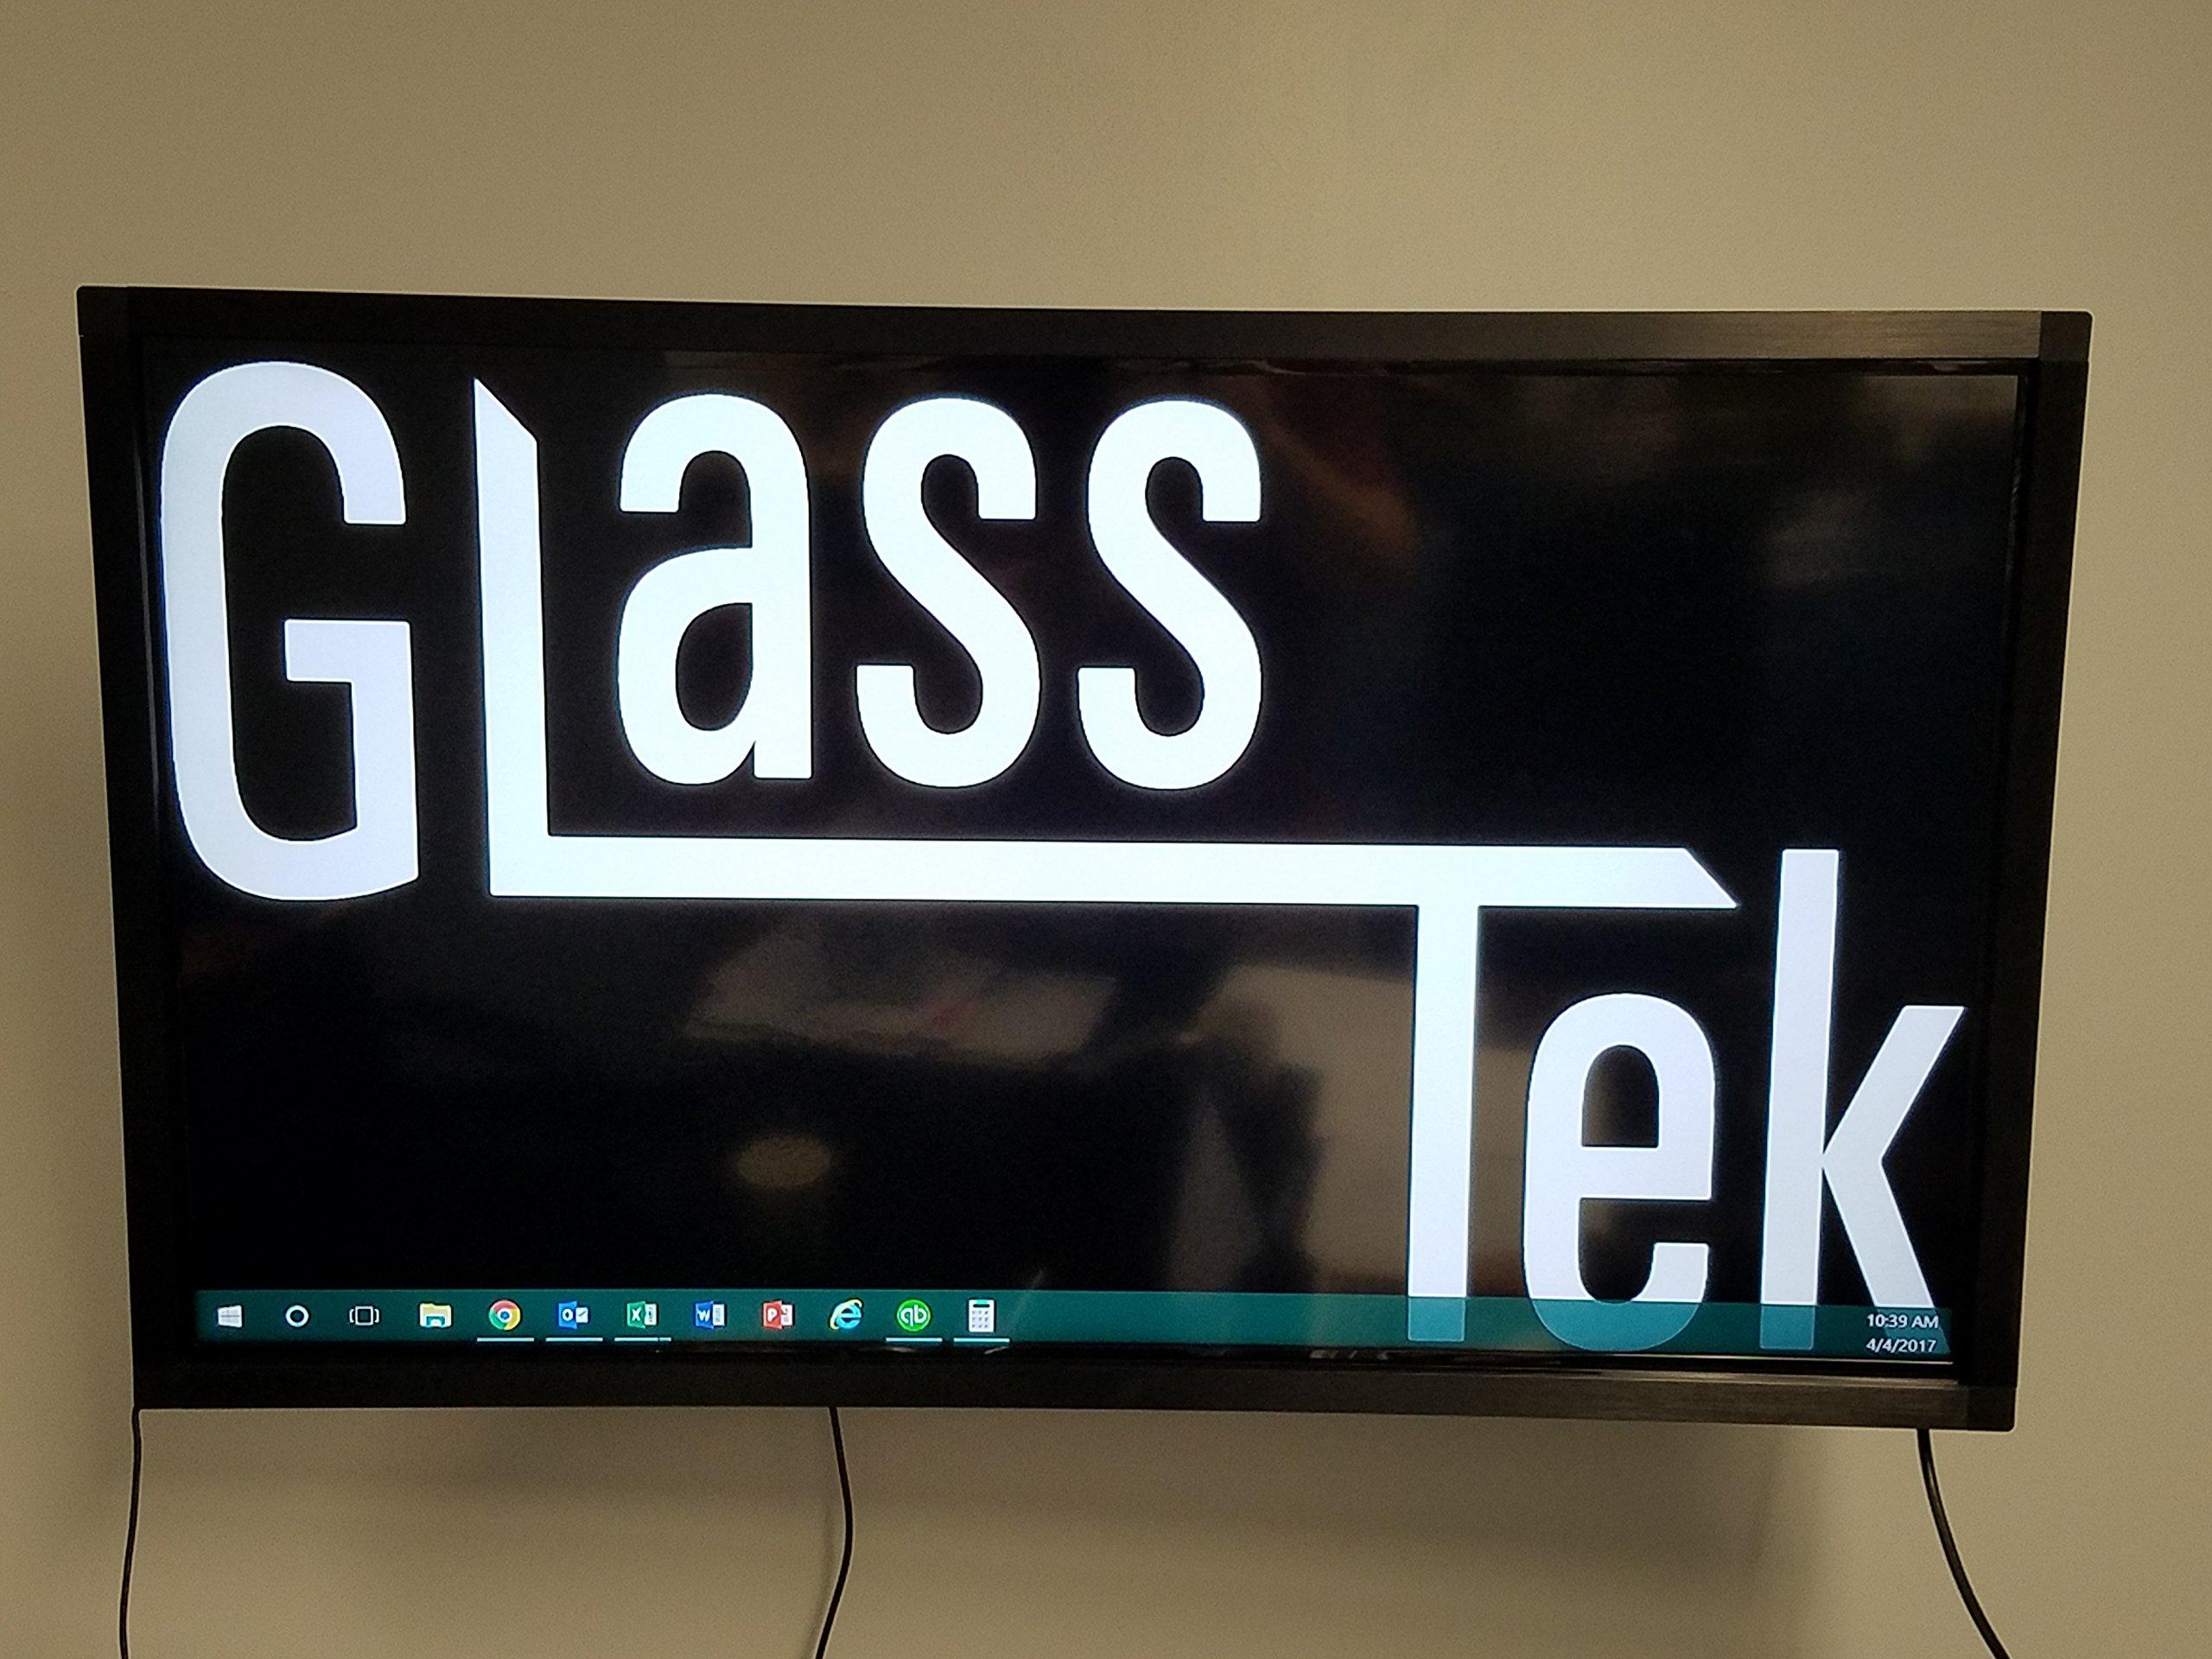 6 Touch Point 75'' IR Touch Screen Frame Overlay by GlassTek Inc. (75'') by GlassTek